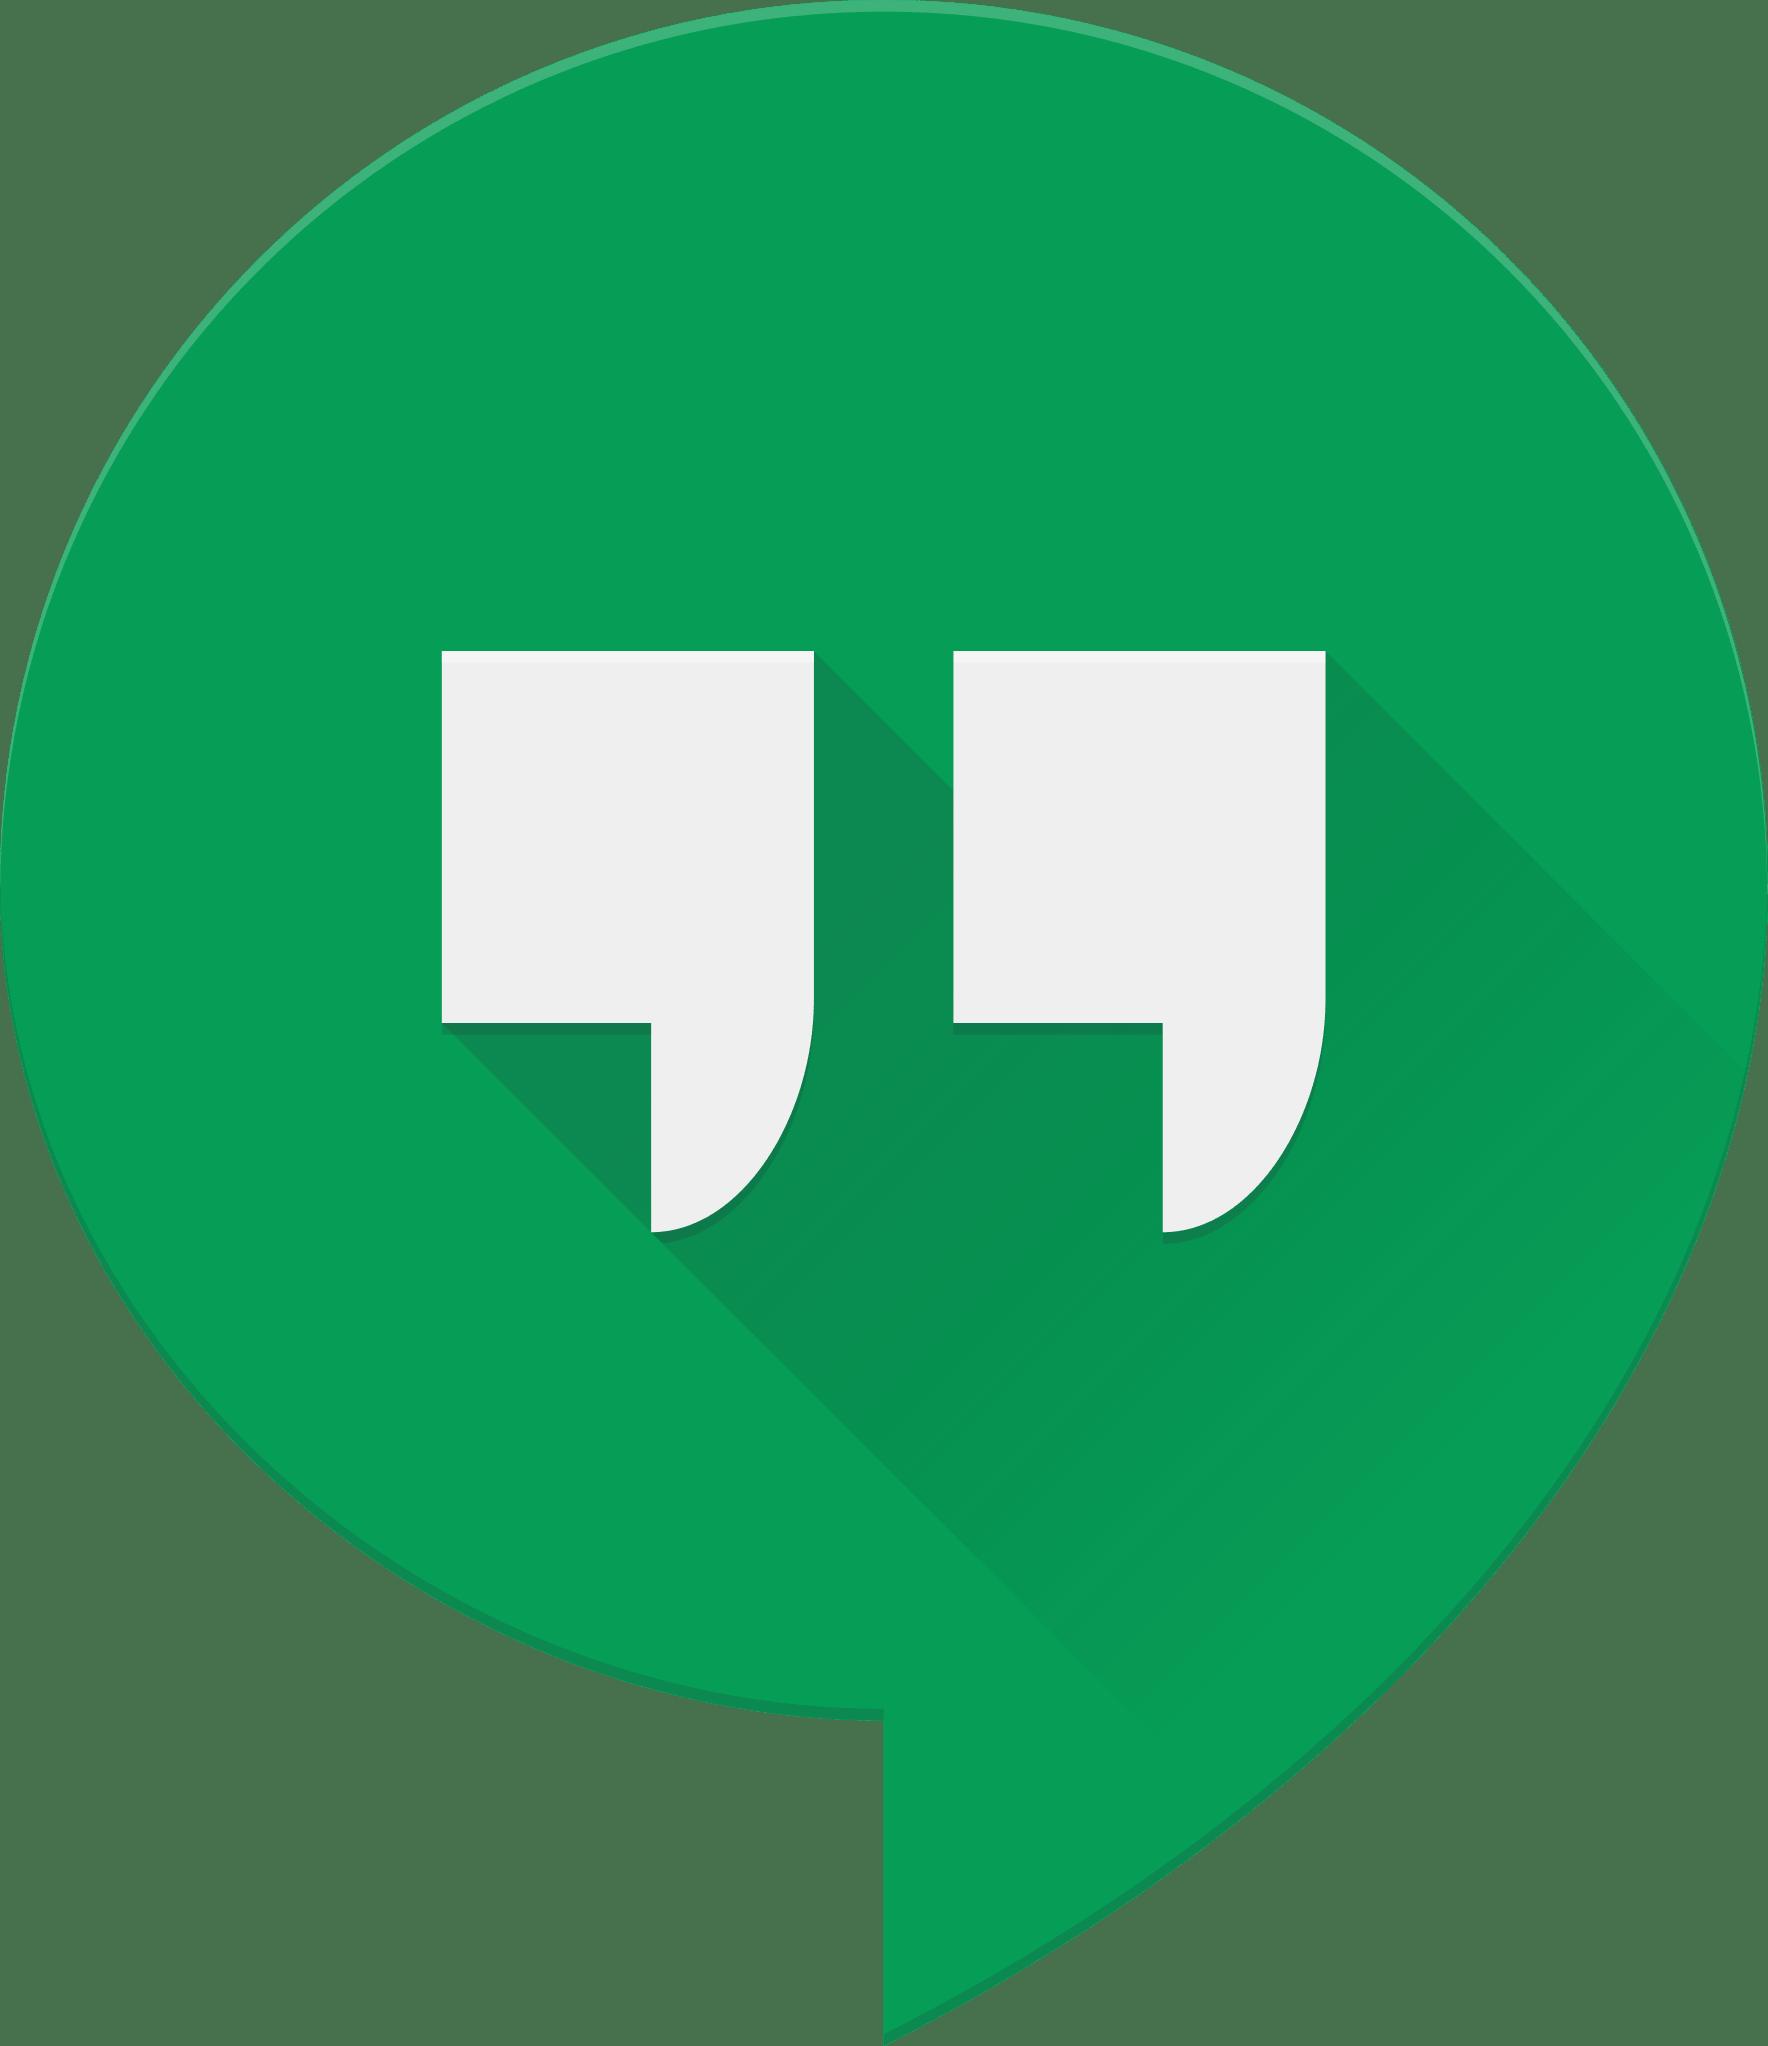 google hangout facetime alternative